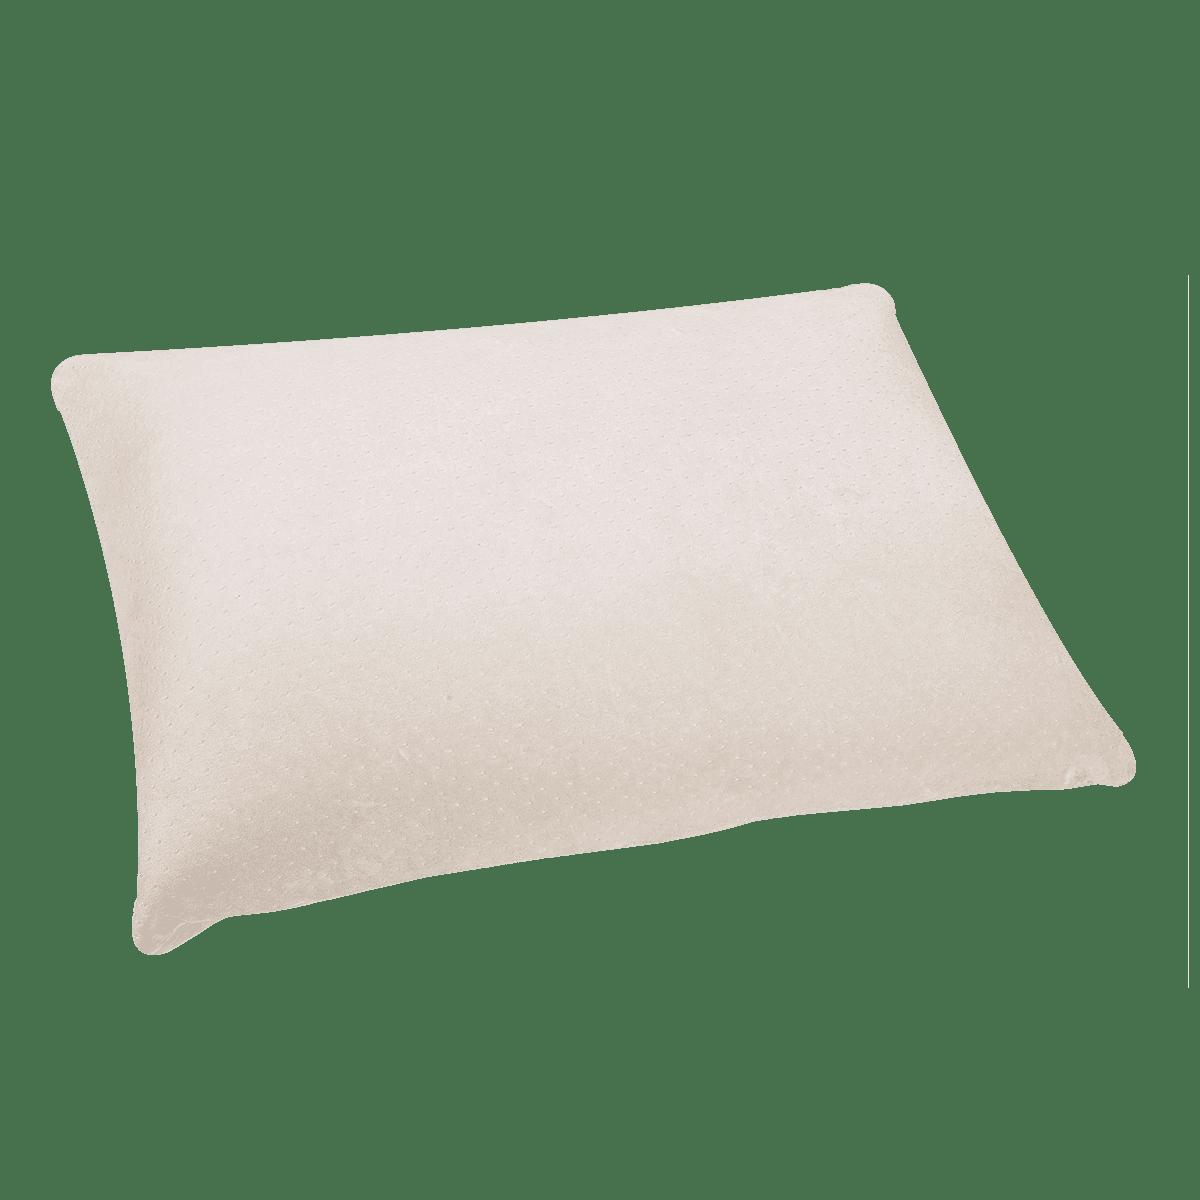 Travesseiro Duoflex Nasa Alto 50x70x17 NS1119 ENR